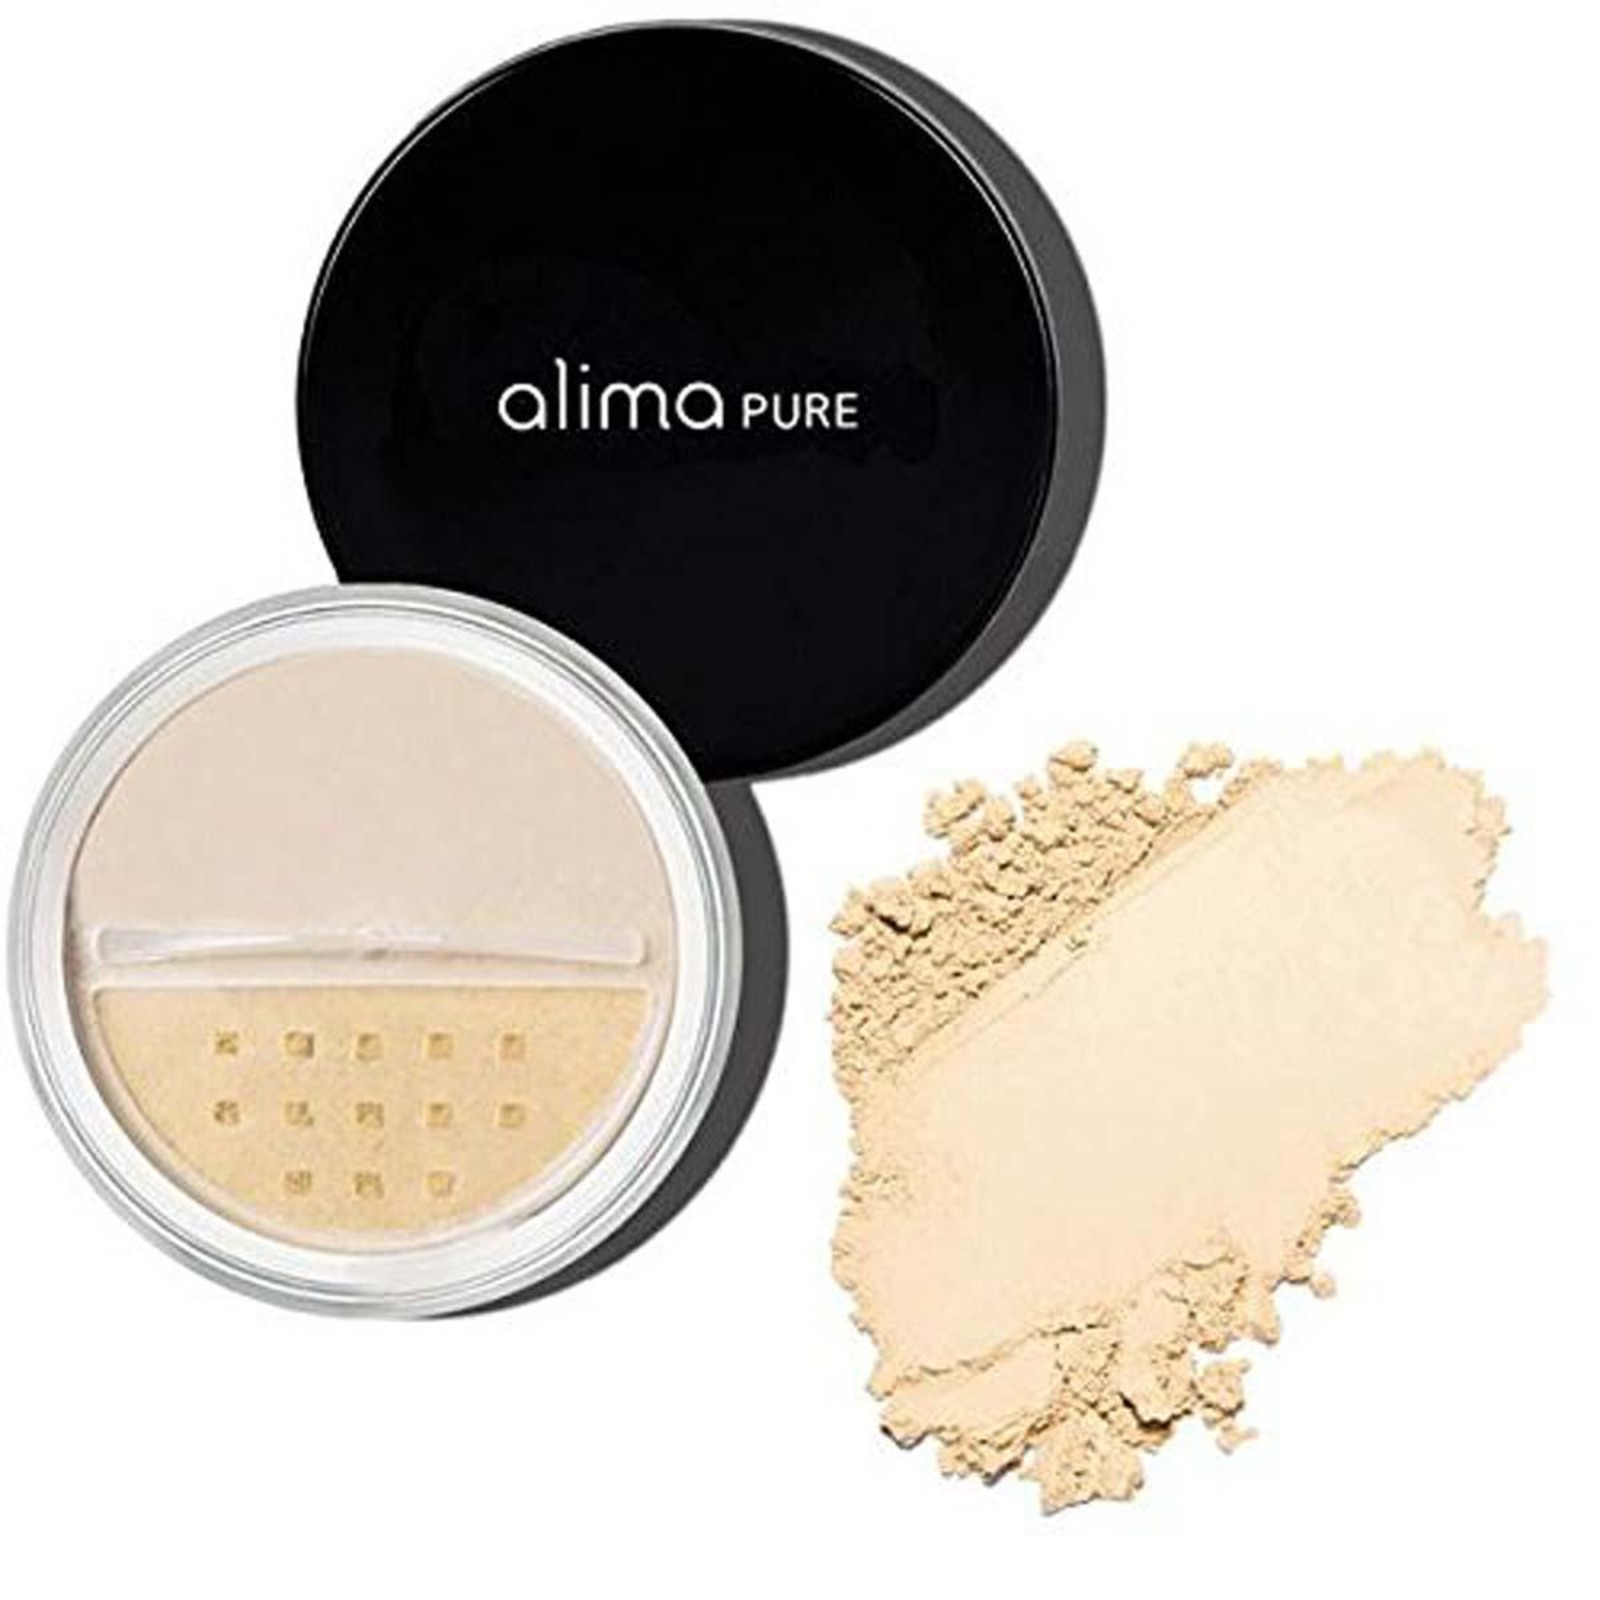 Alima Pure Satin Matte Foundation Warm 2 Ntuc Fairprice